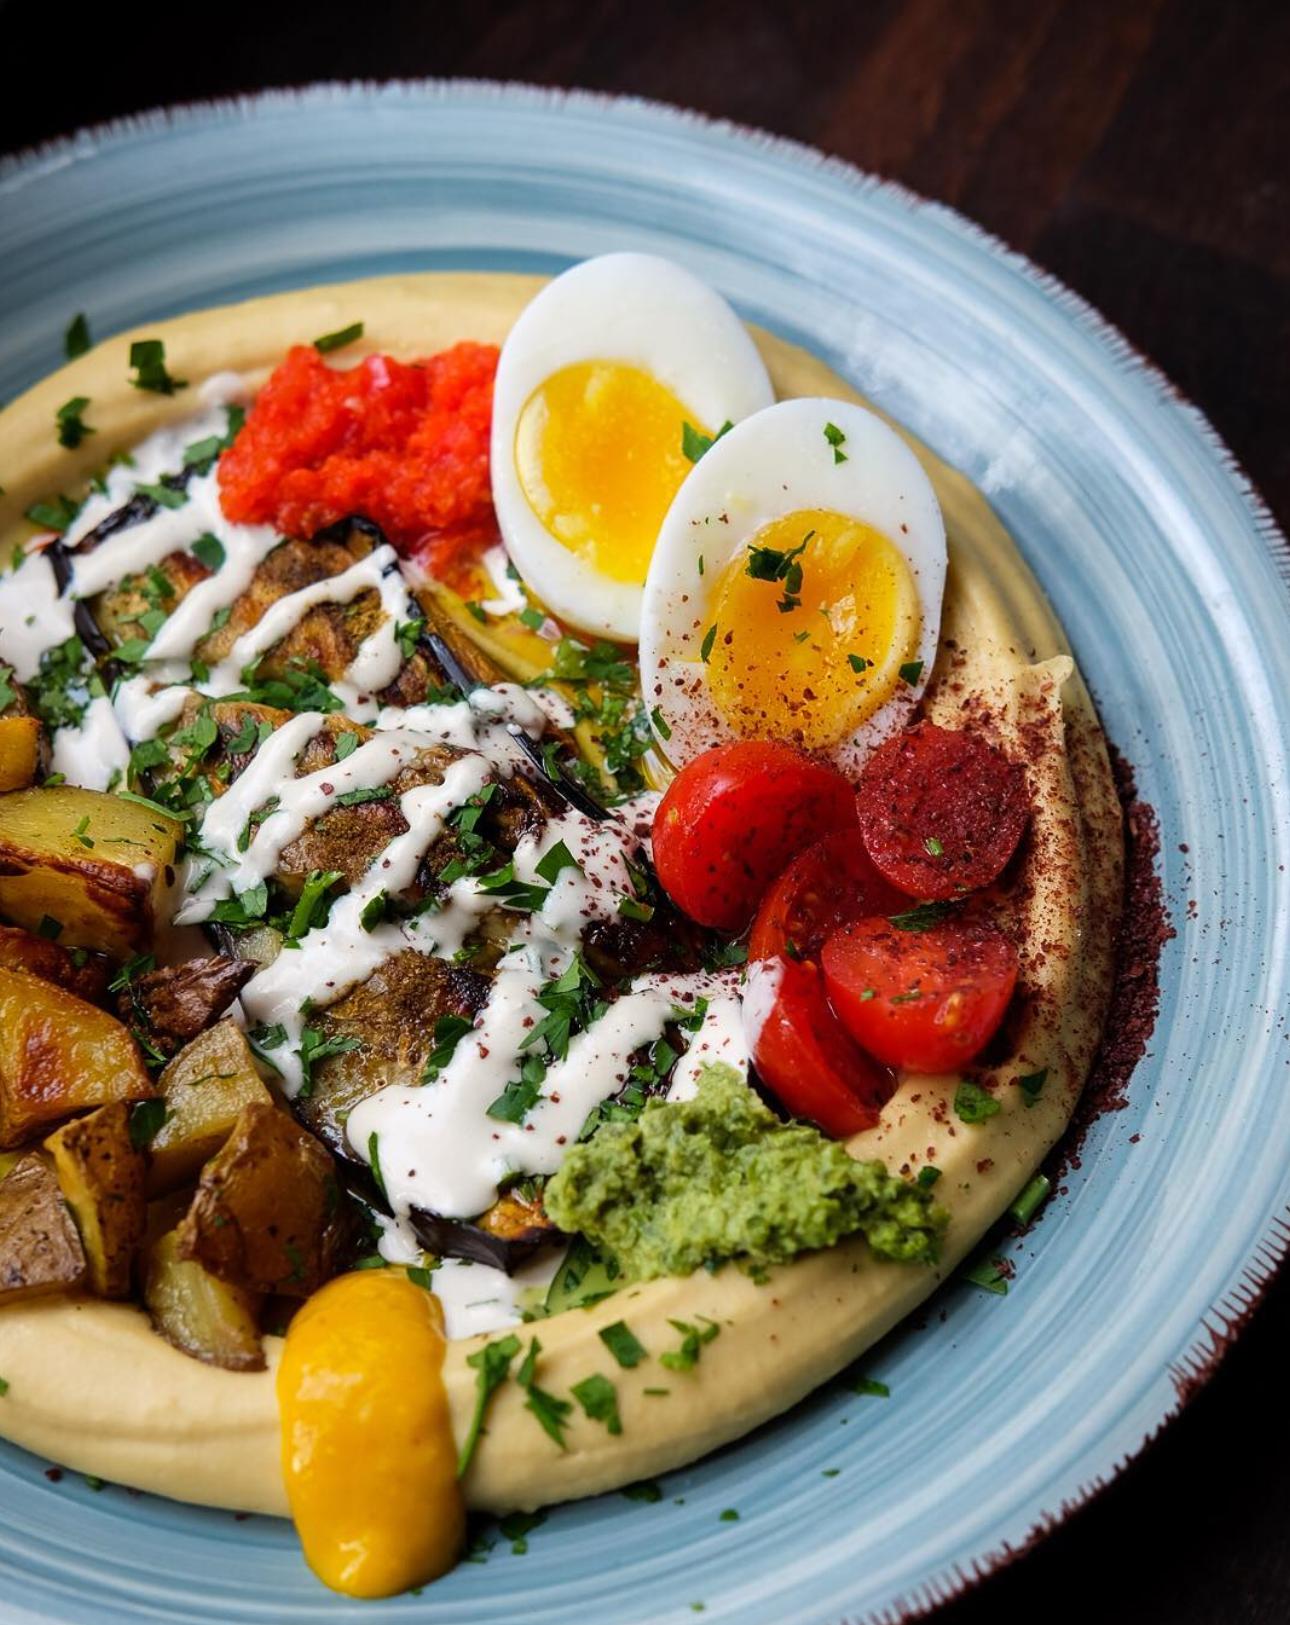 Hummus with tomatoes, eggs and potatoes at Cafe Mugrabi Berlin